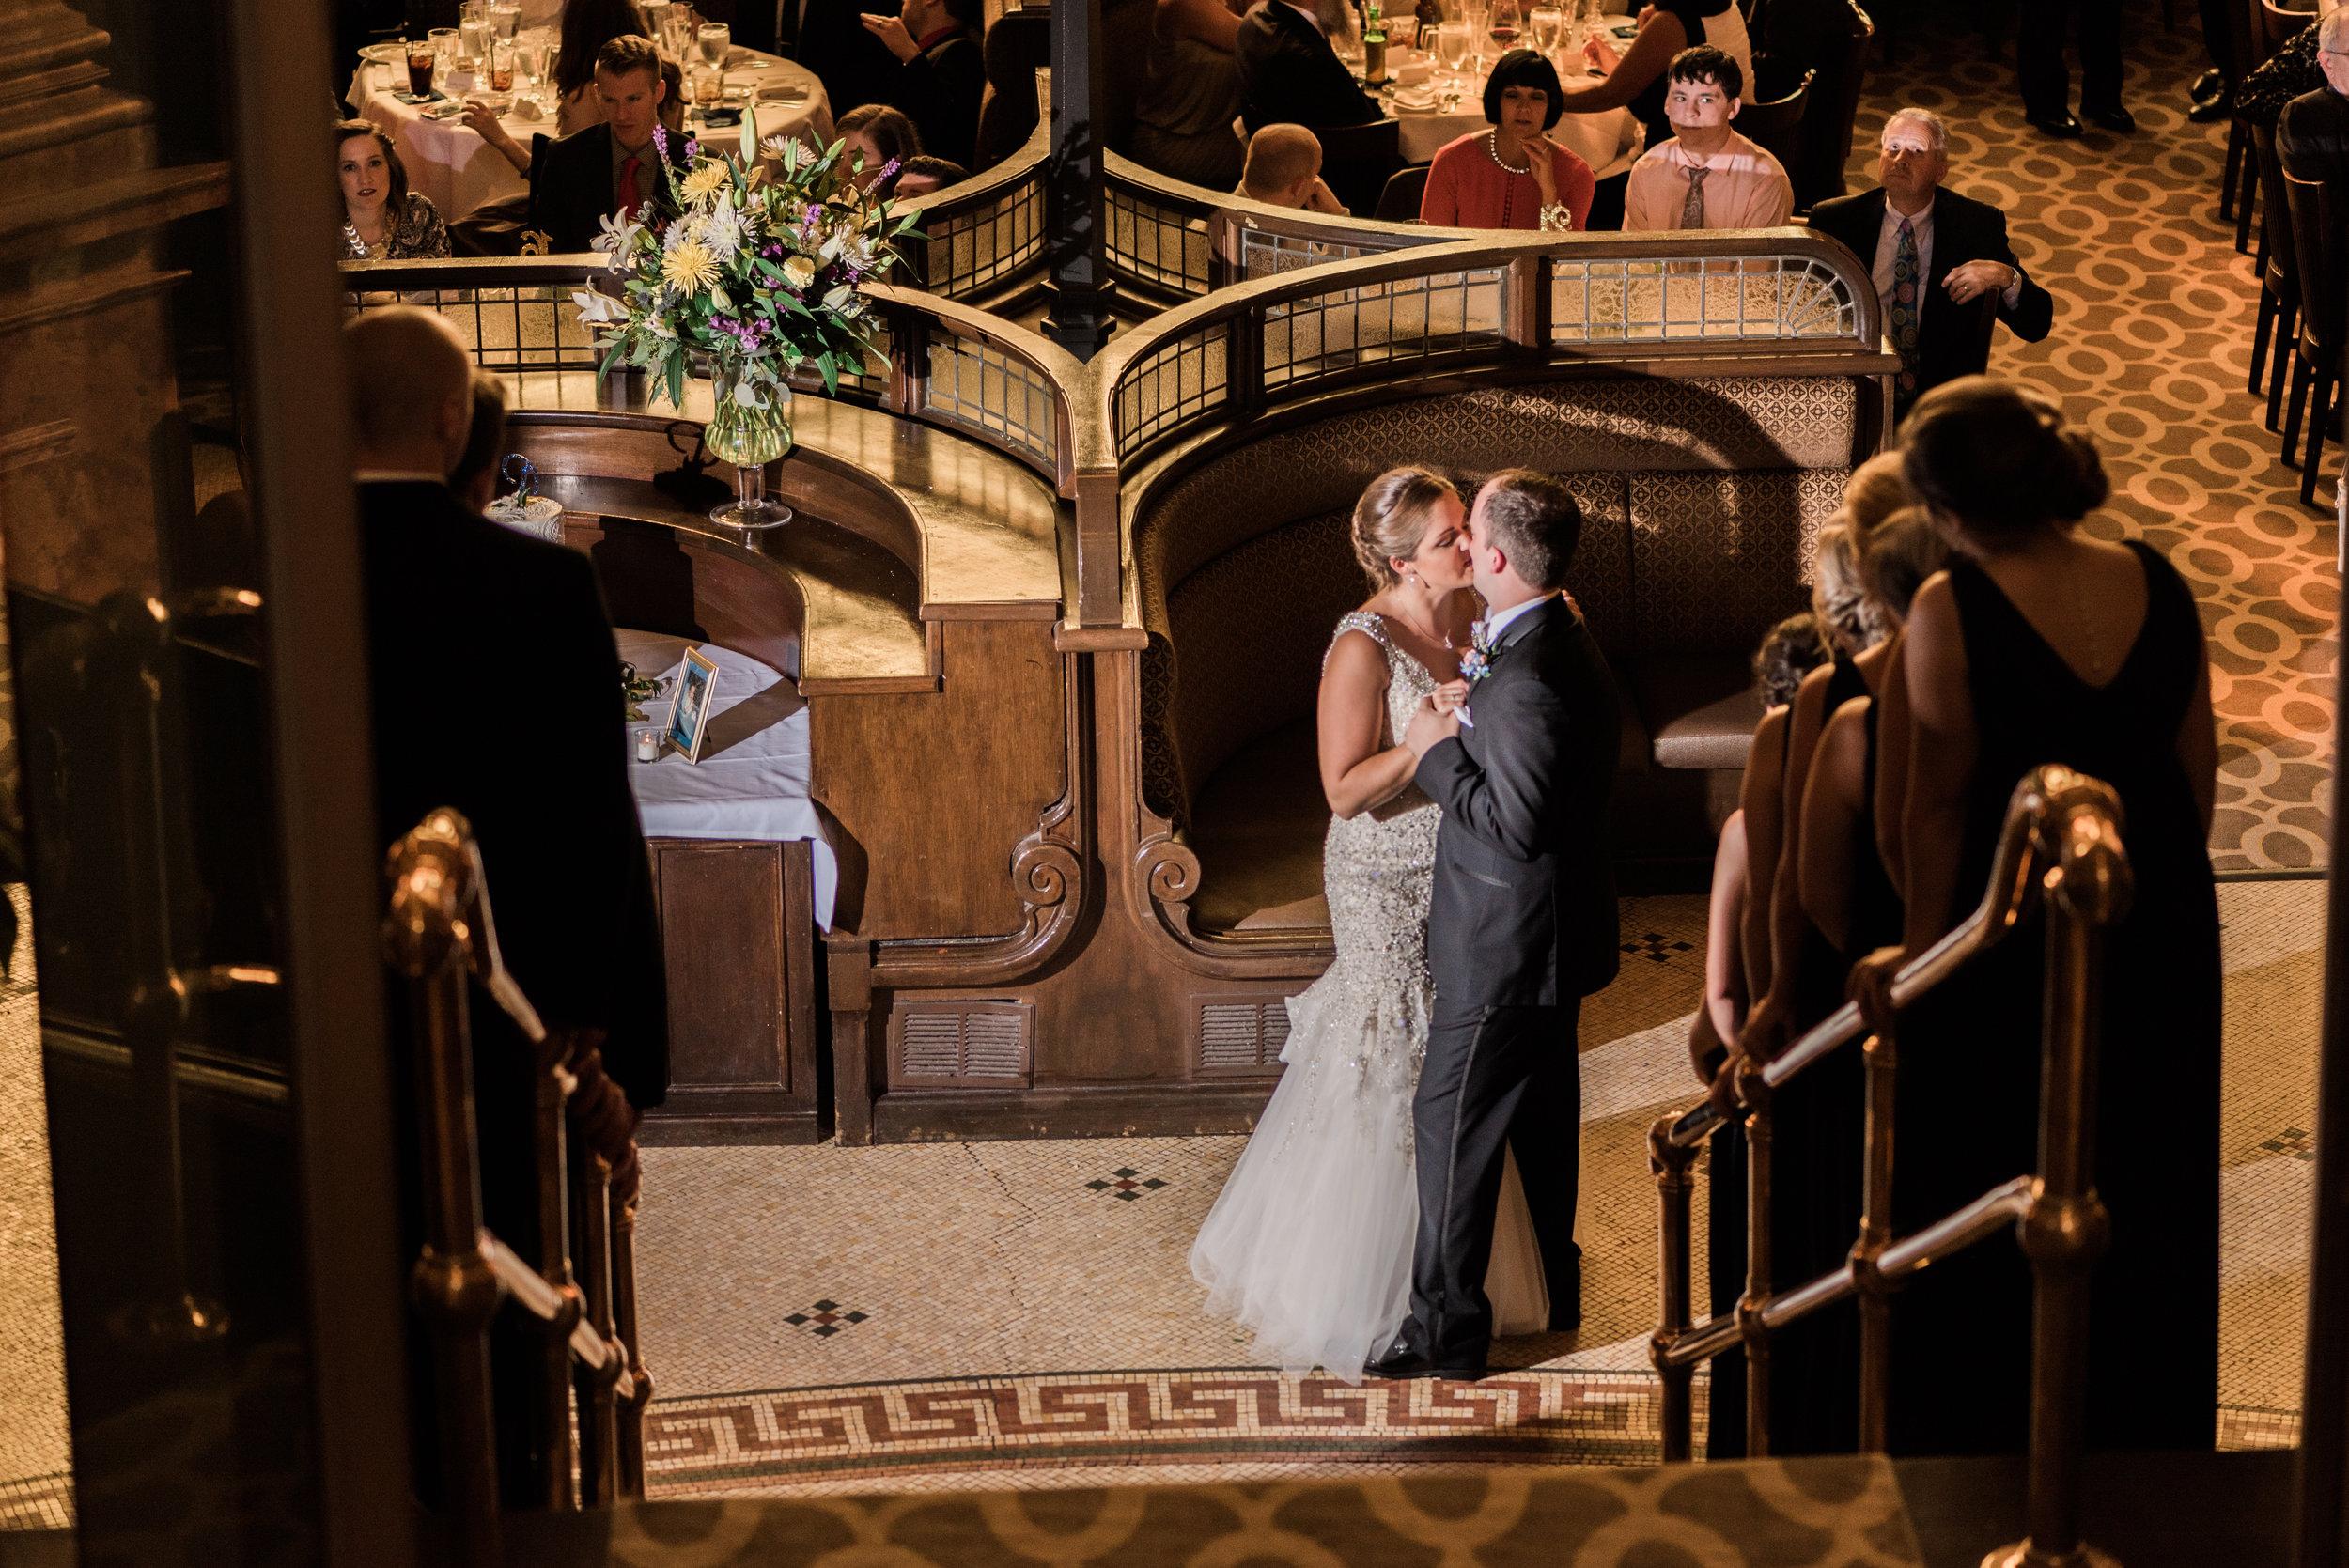 pollockwedding-9236.jpg